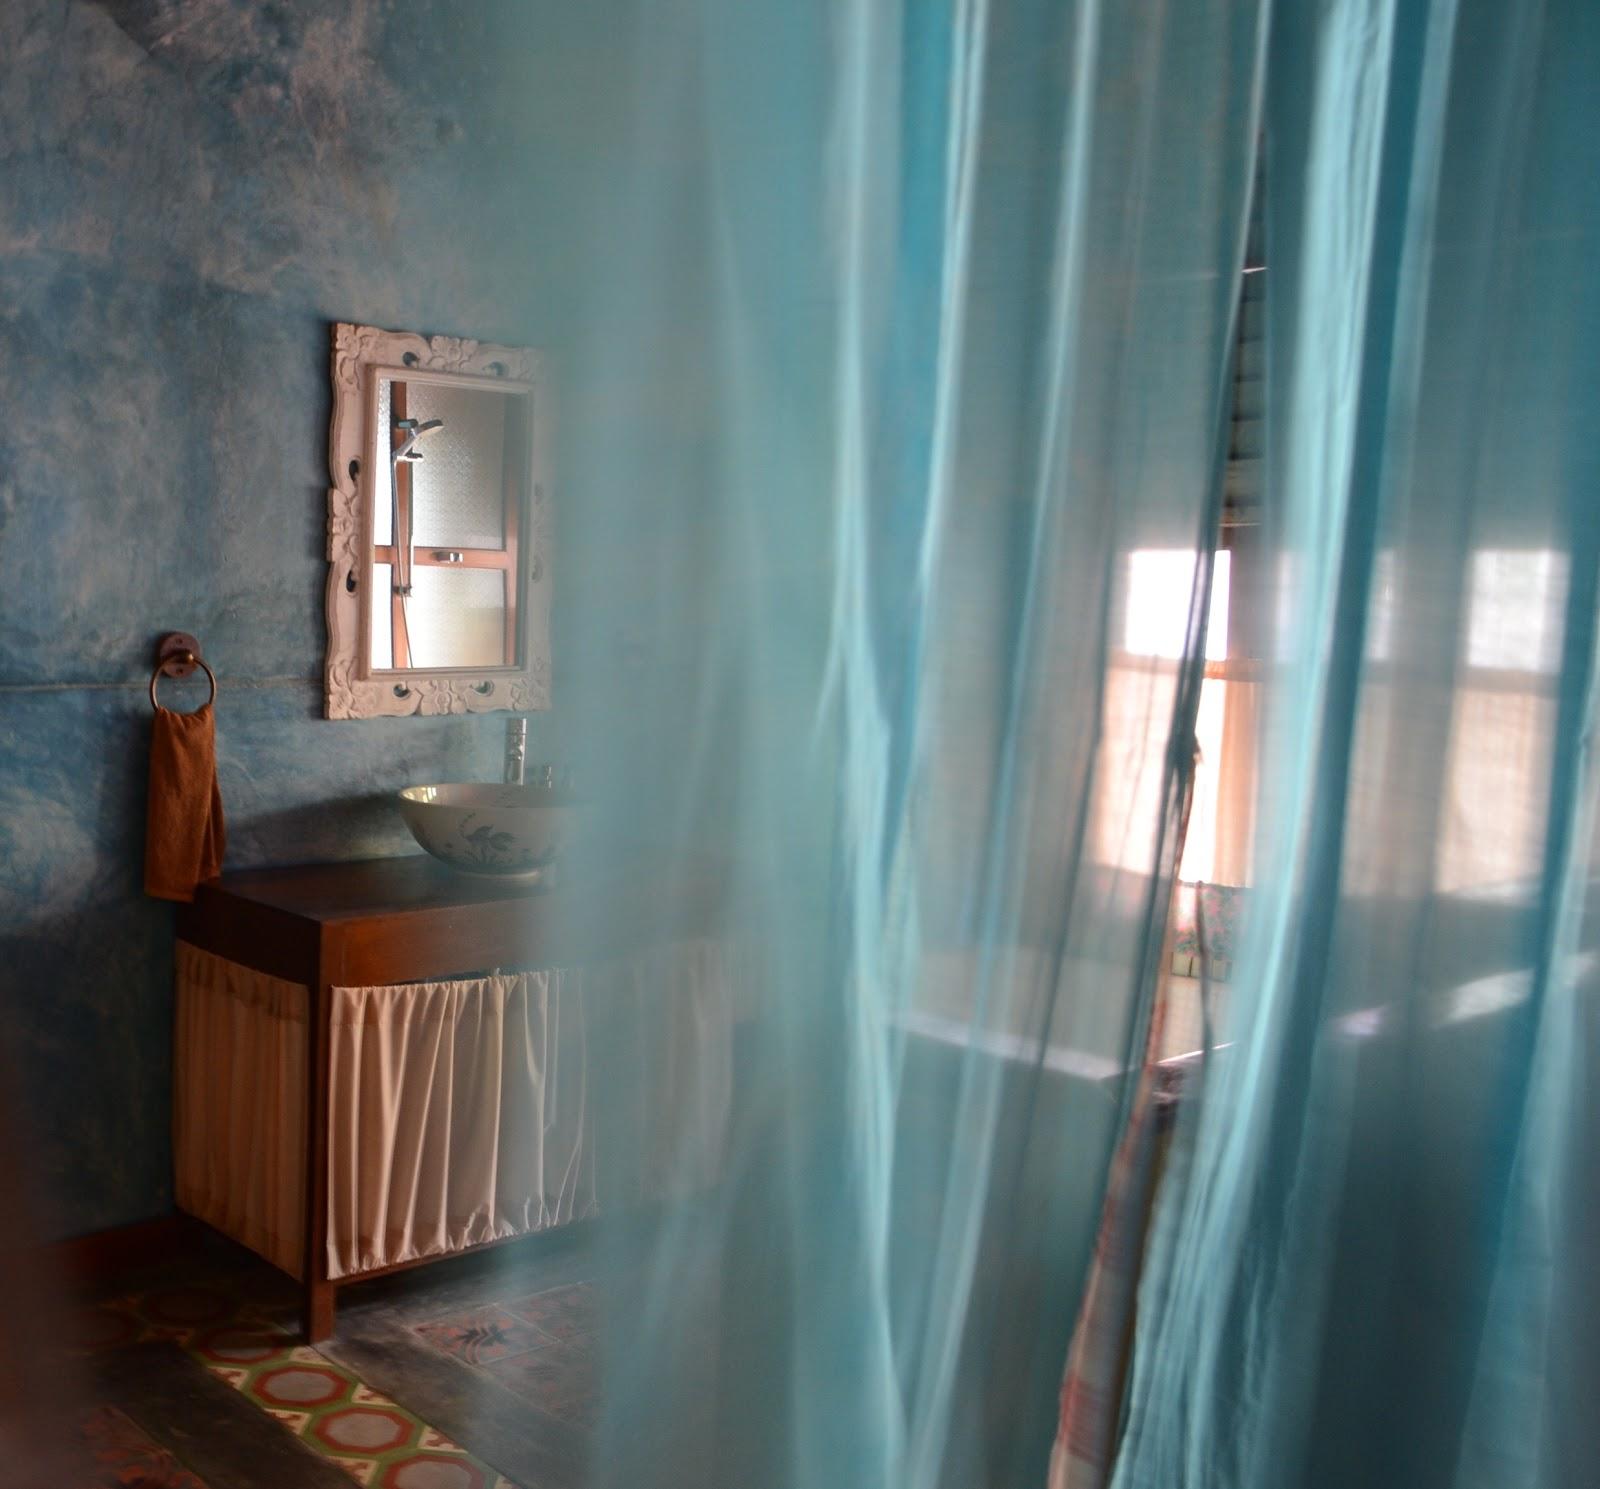 Salle De Bains Dakar ~ ventilateur salle de bain panasonic belle maison design tarzx com